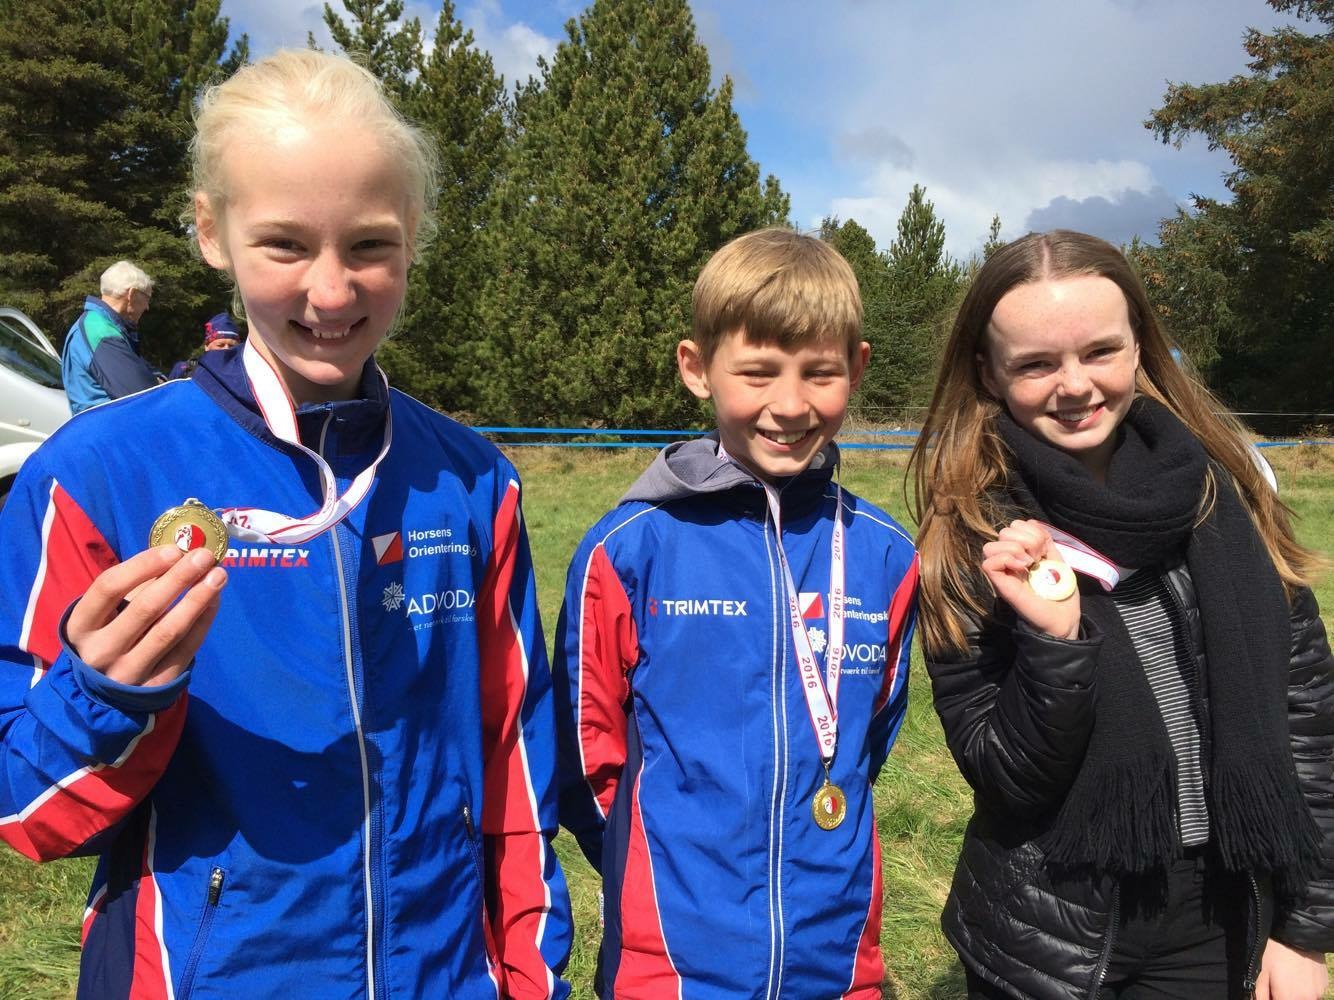 Glade juniorer til ultra-langdistance på Rømø med deres  medaljer. Fra venstre Theresa Skouboe, Jacob Klærke Mikkelsen og Rebecca Loft Thyssen